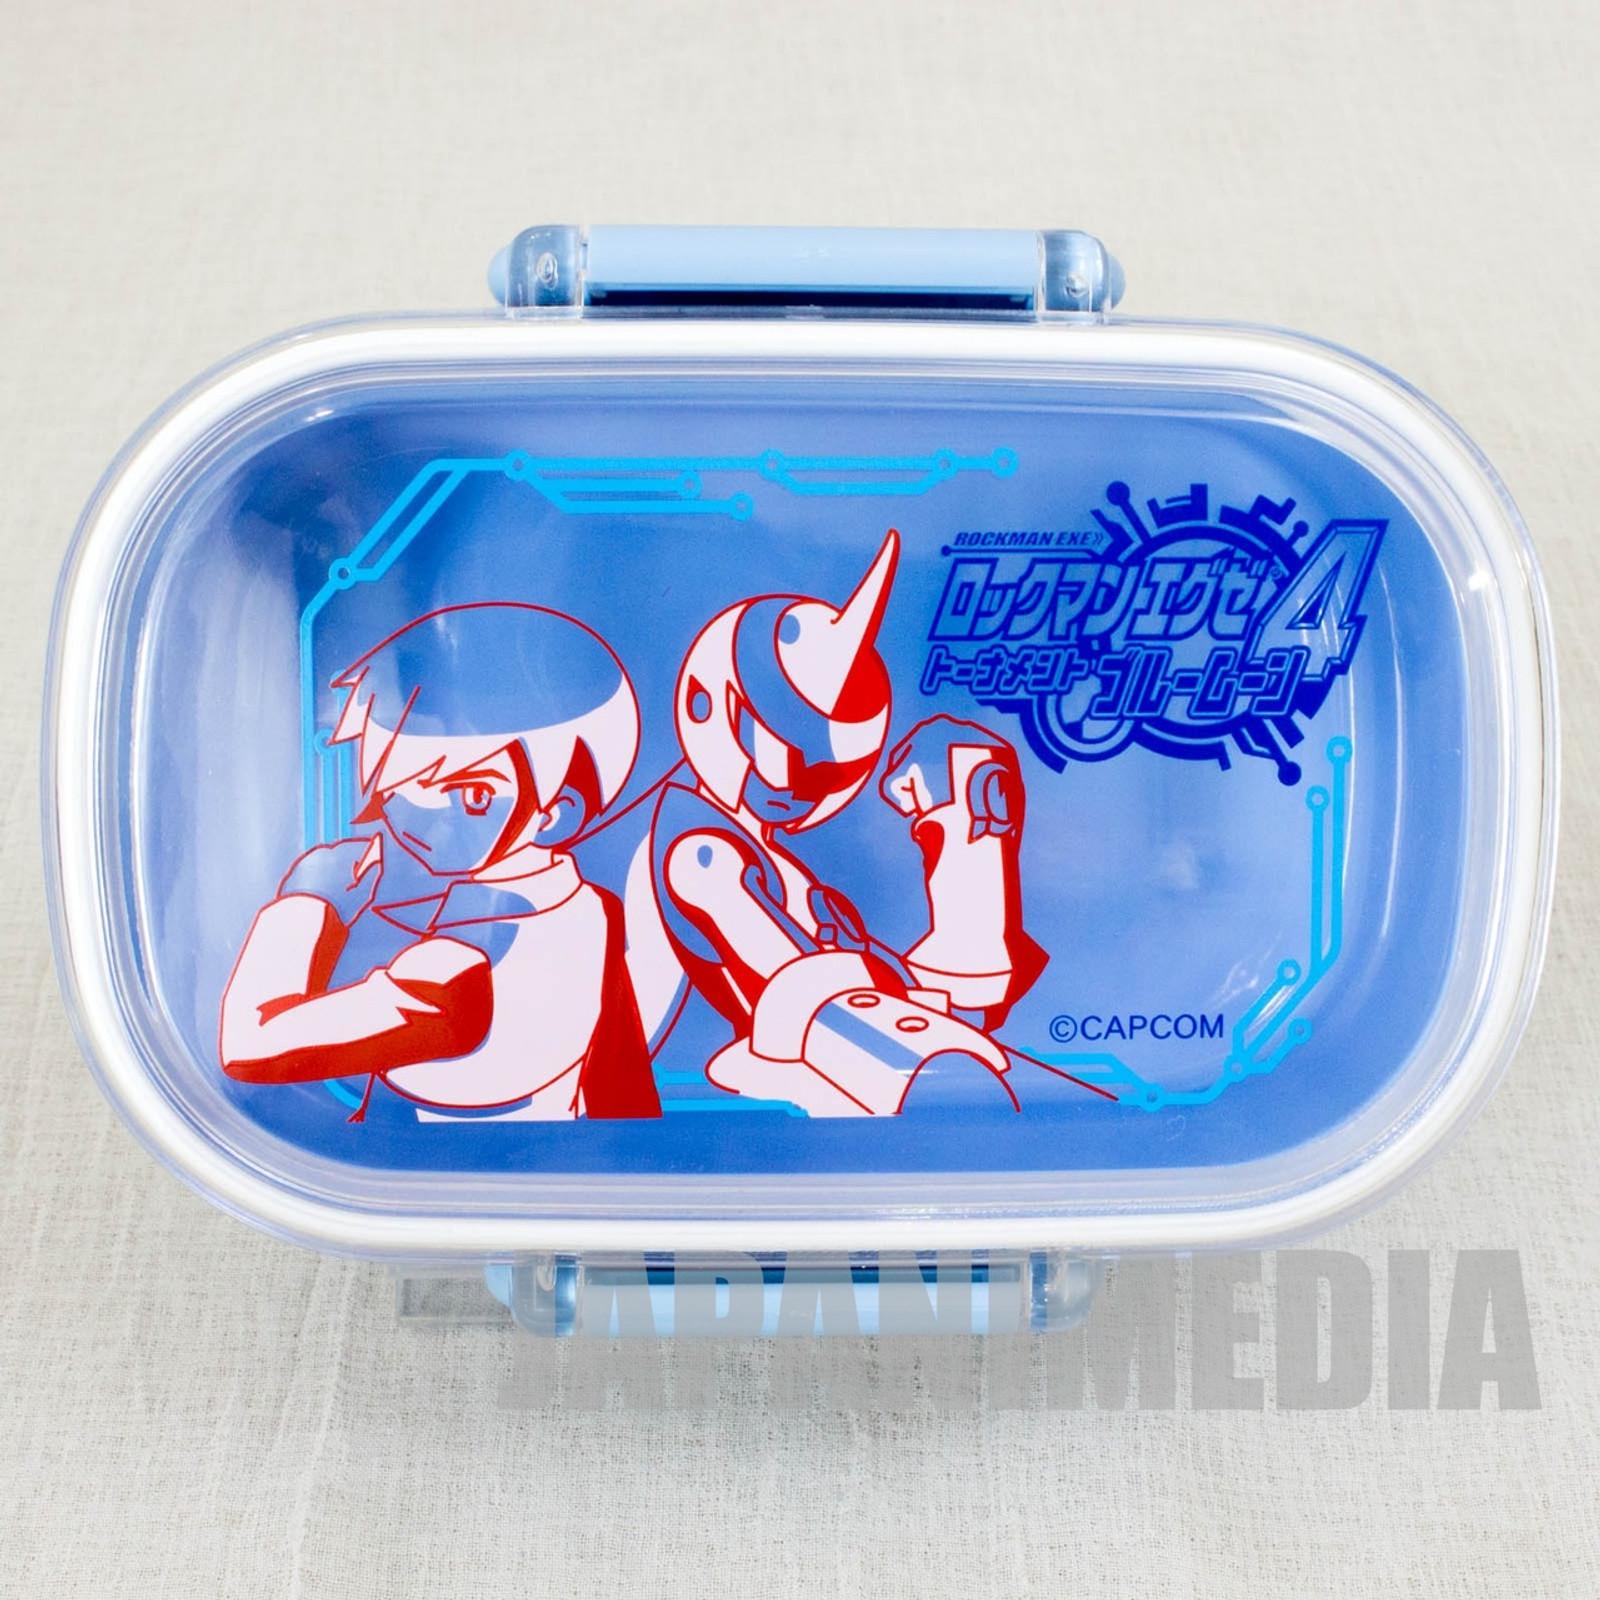 Rockman Exe 4 Tournament Blue Moon Lunch Box JAPAN GAME CAPCOM Mega man